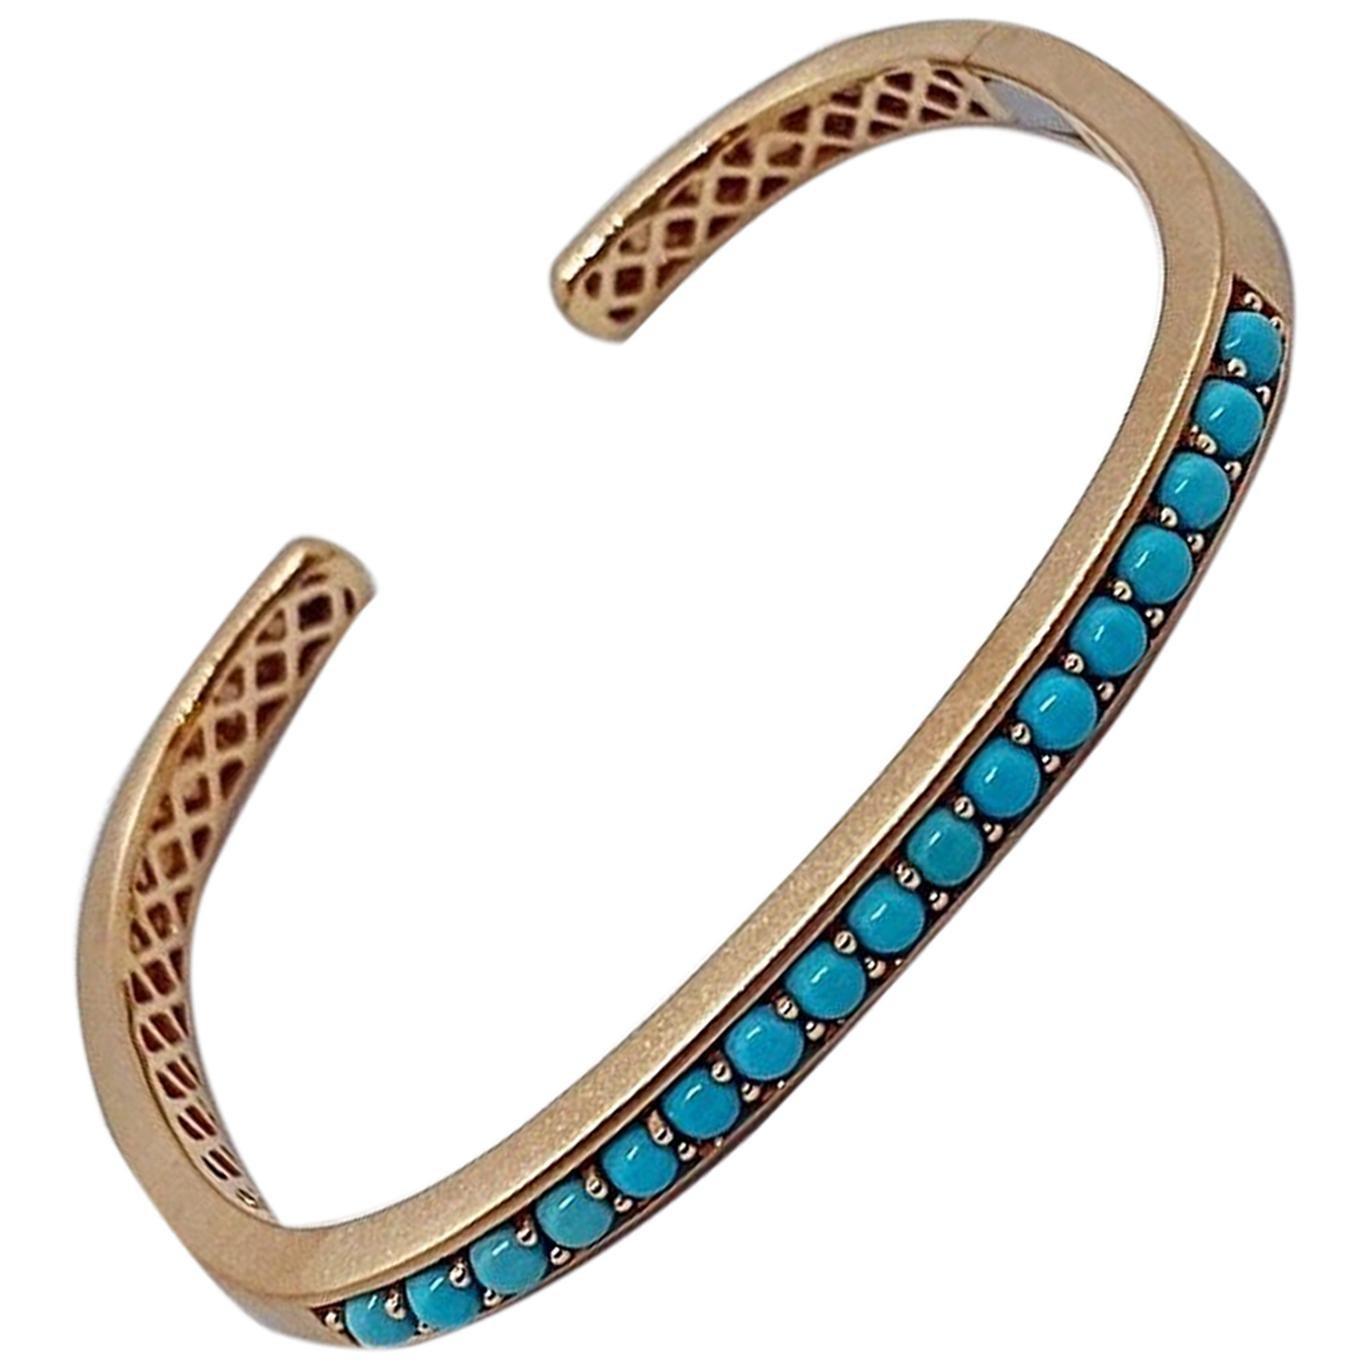 Jane Taylor 18 Karat Rose Gold Cuff Bracelet with Cabochon Turquoise